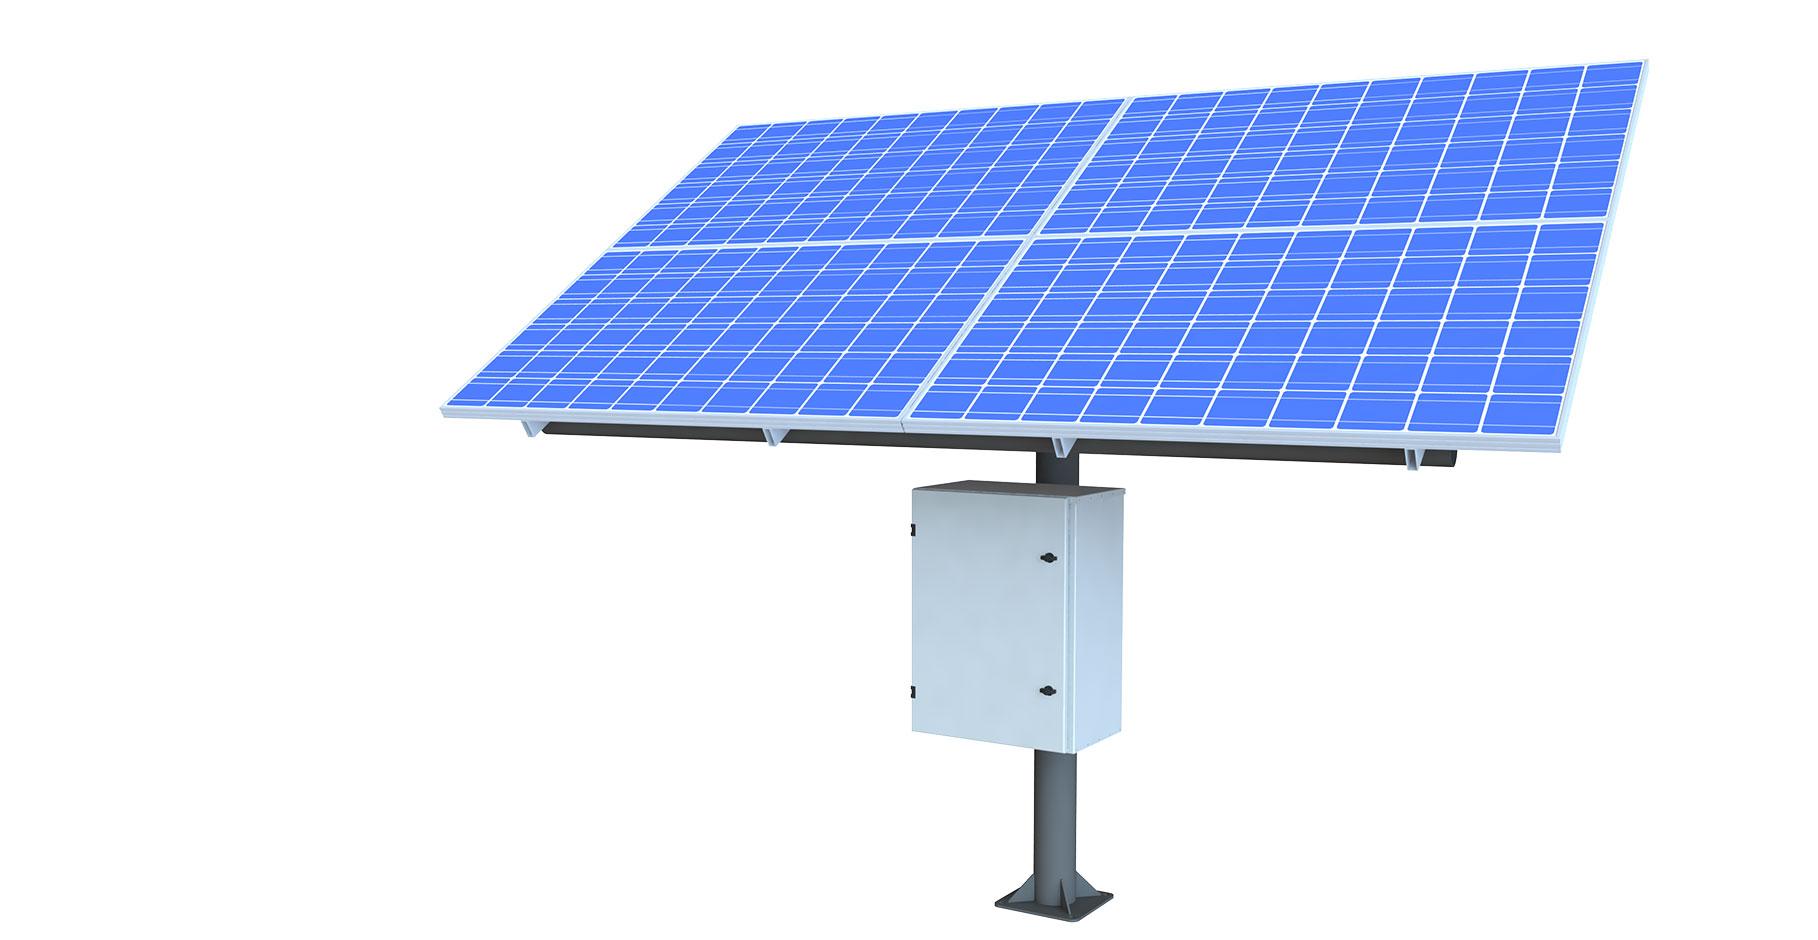 Paneles solares.Soluciones de energía autónoma de KBC Networks